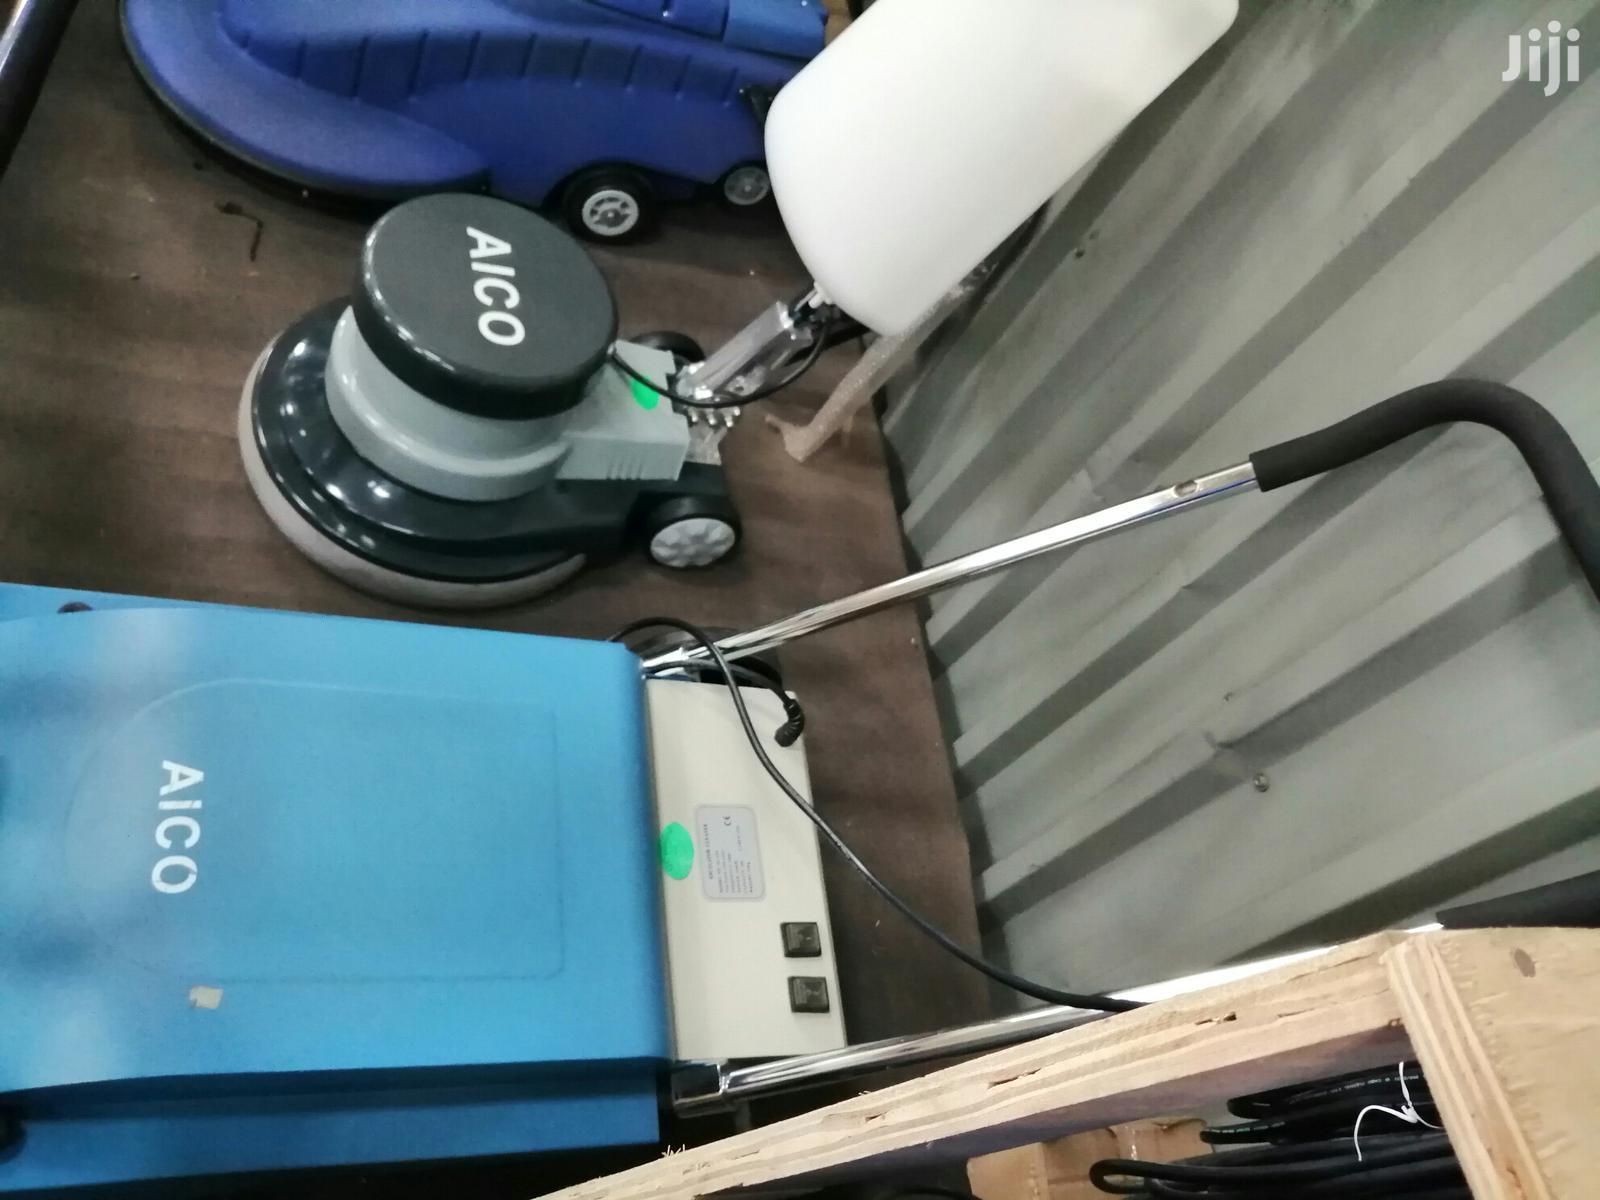 Brand New Floor Scrubber